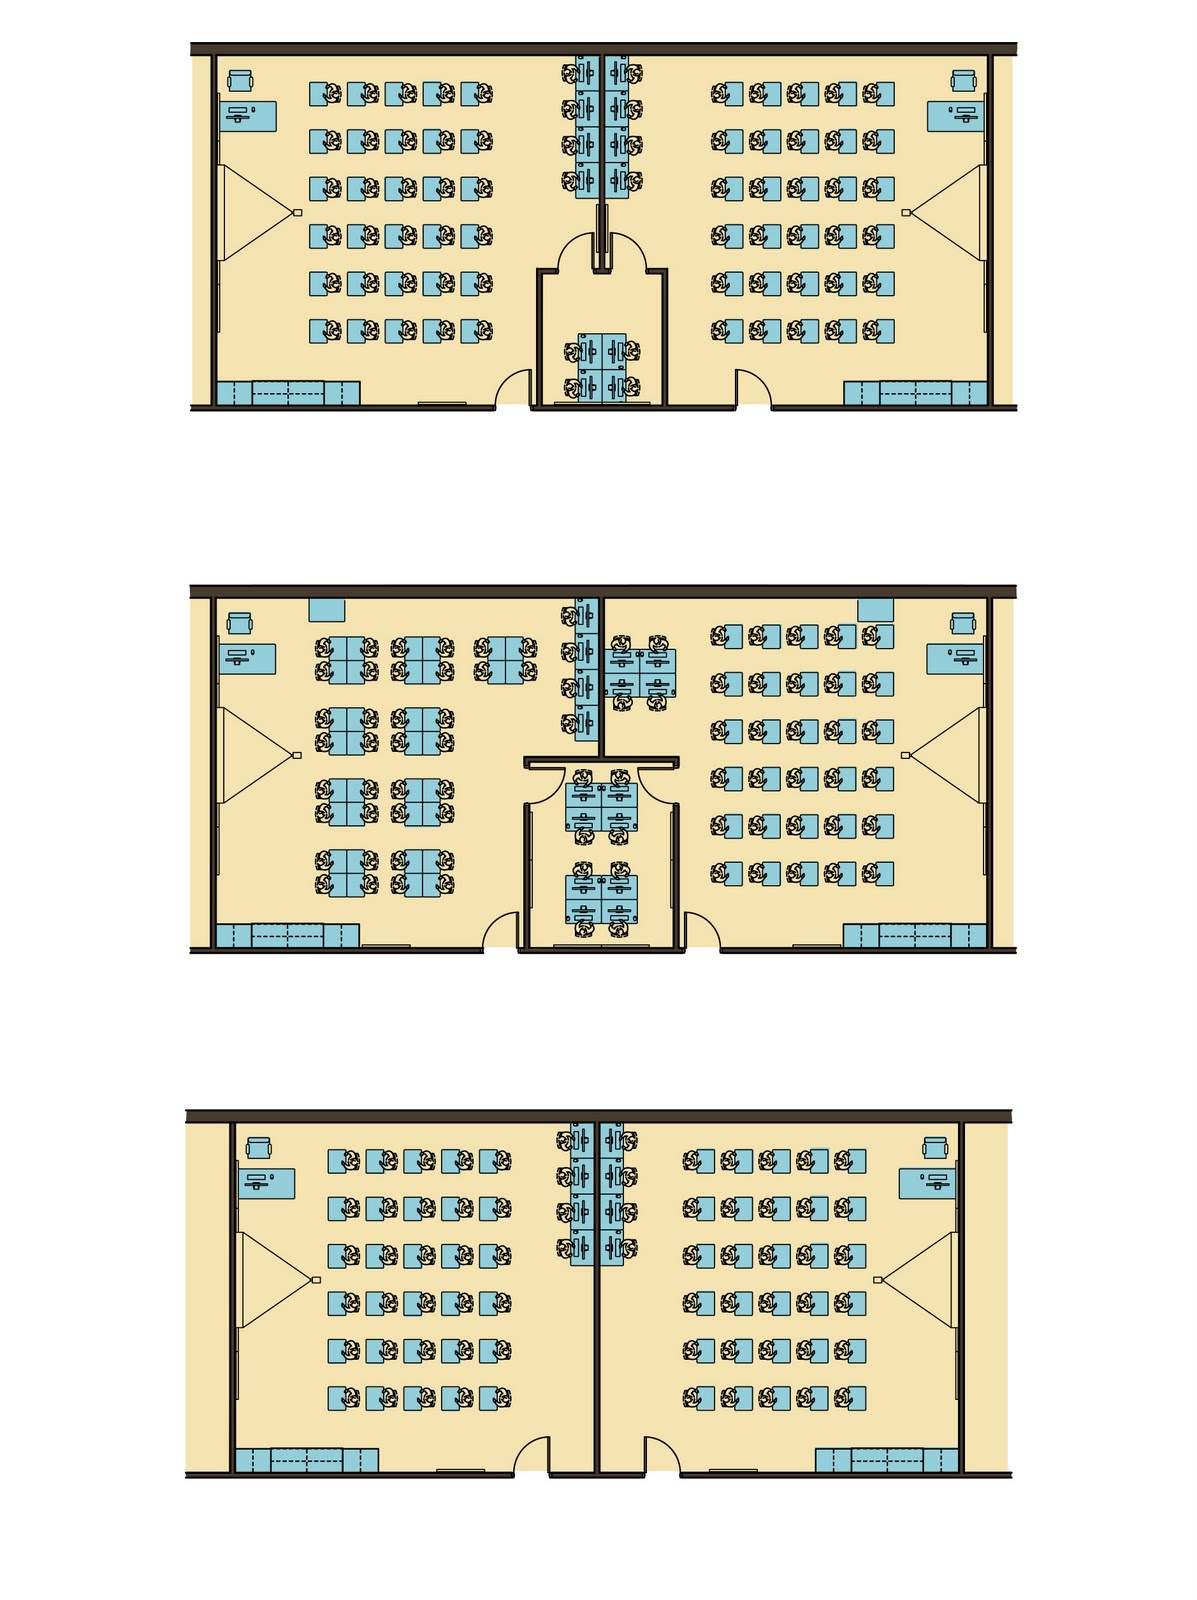 Classroom architect